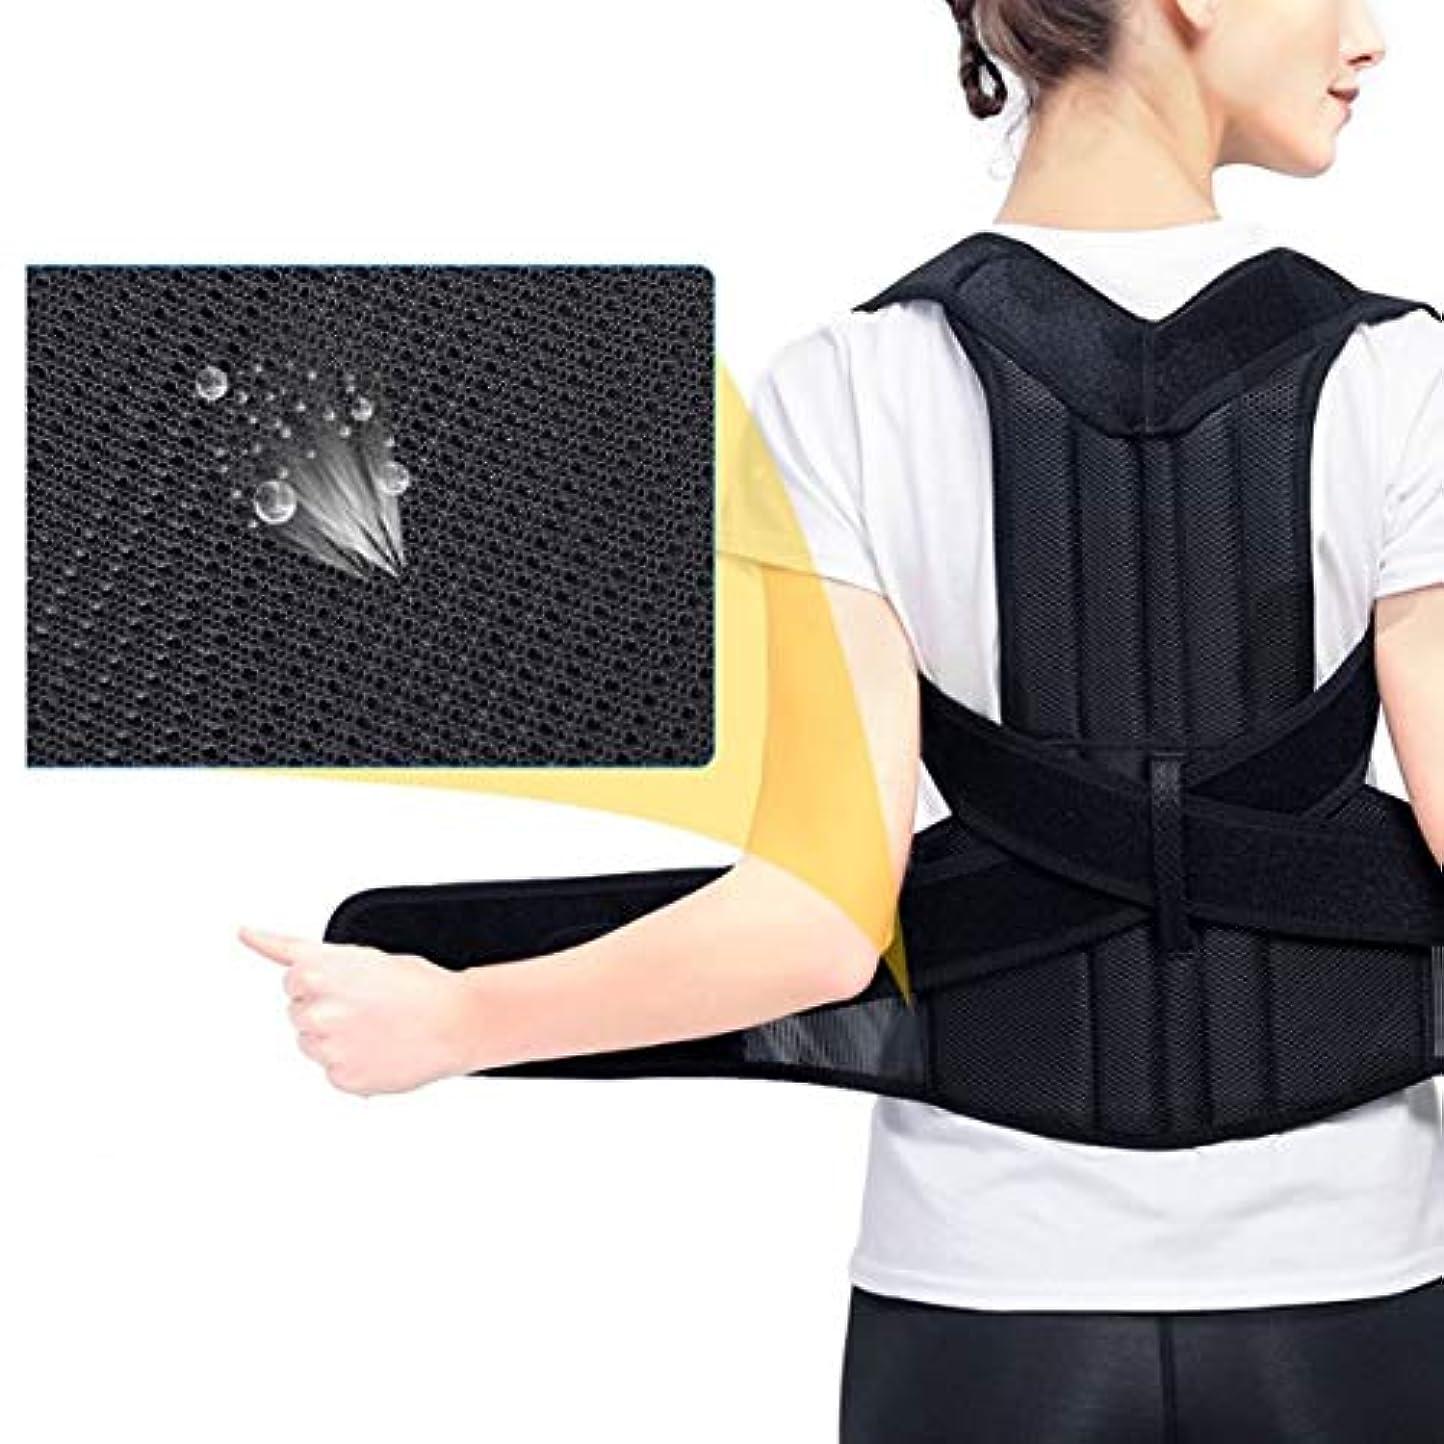 小人シーボード共同選択腰椎矯正バックブレース背骨装具側弯症腰椎サポート脊椎湾曲装具固定用姿勢 - 黒